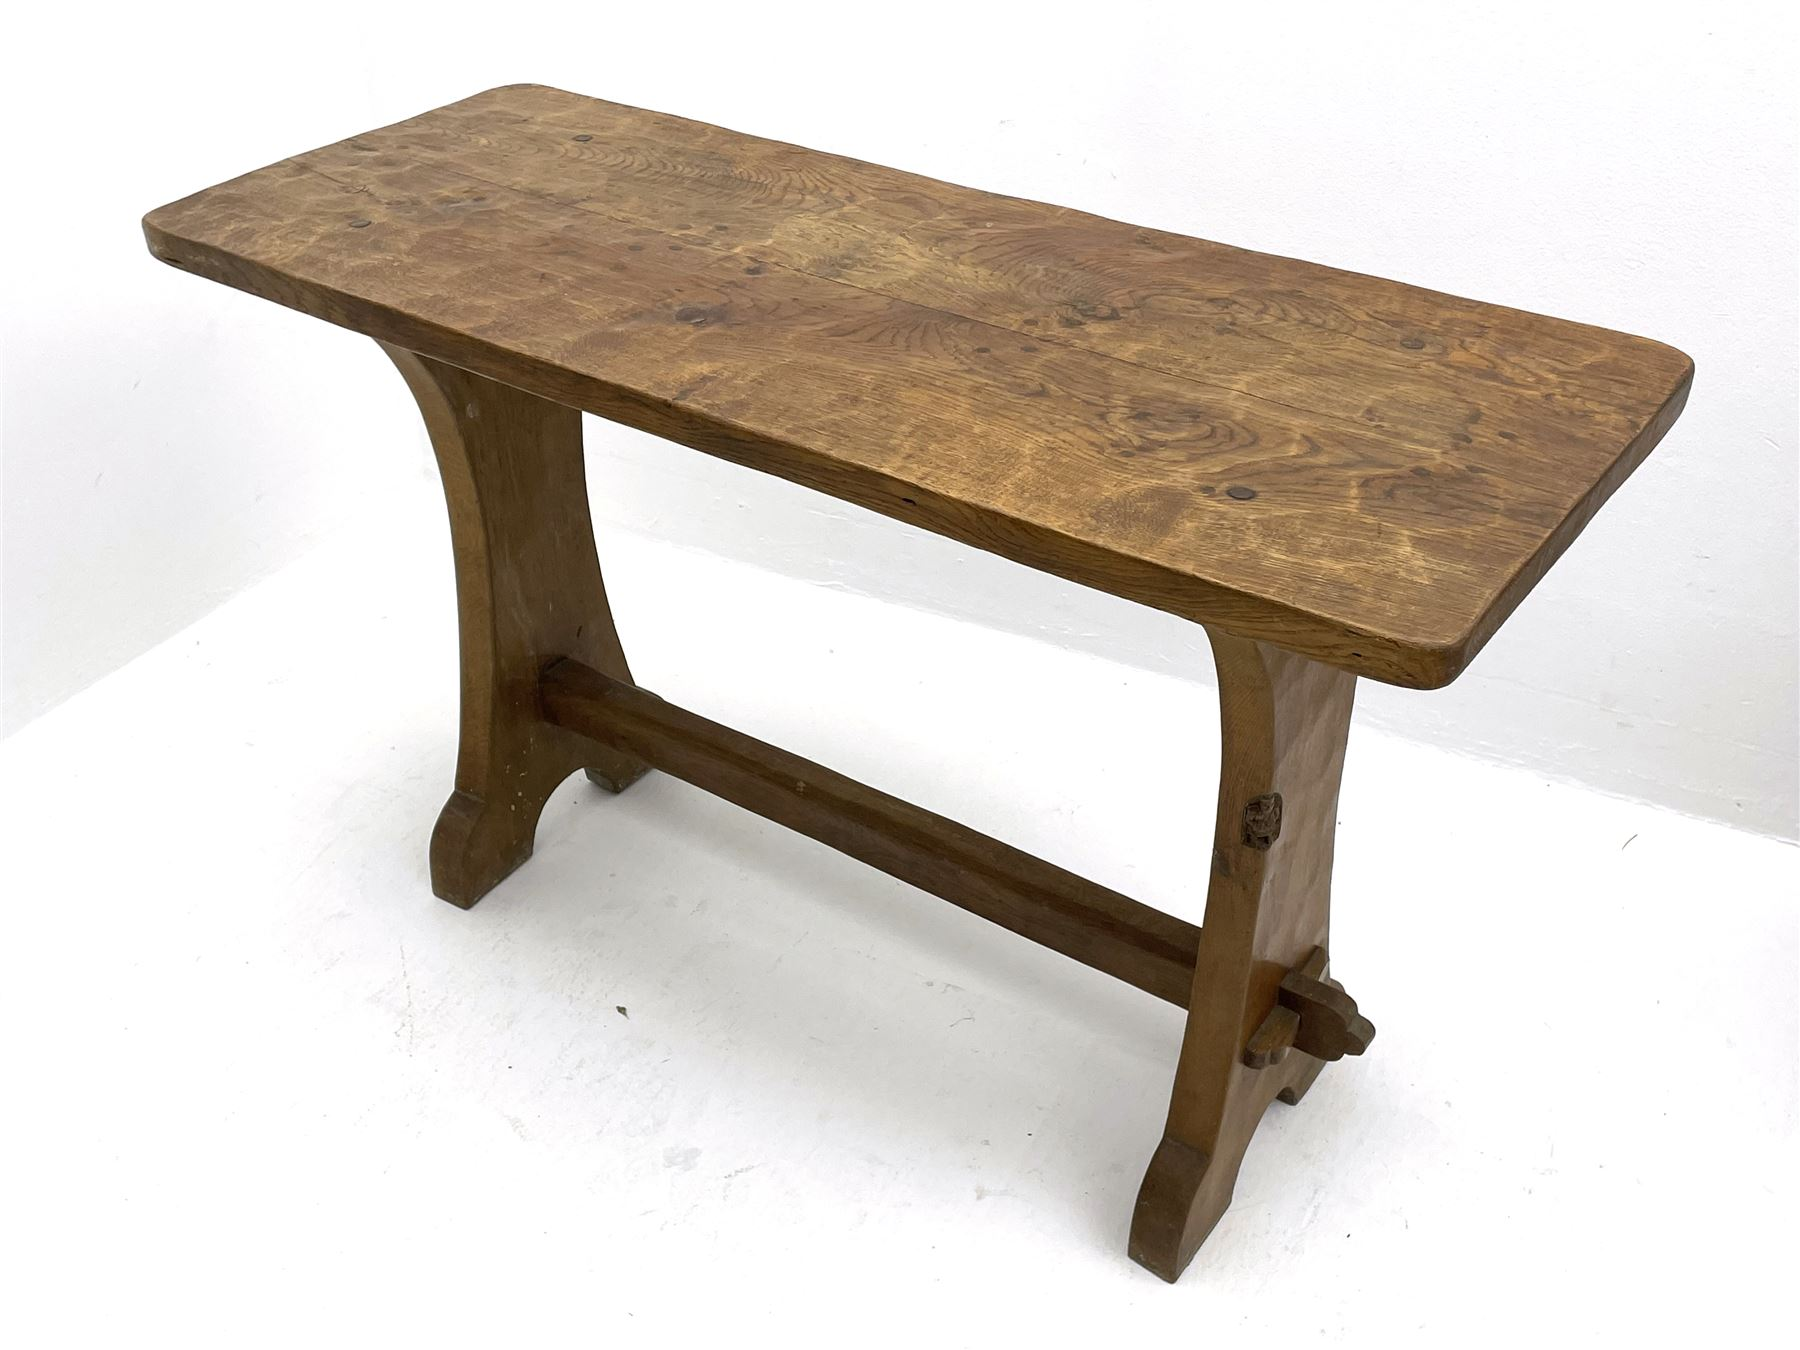 'Gnomeman' adzed oak side table - Image 4 of 4